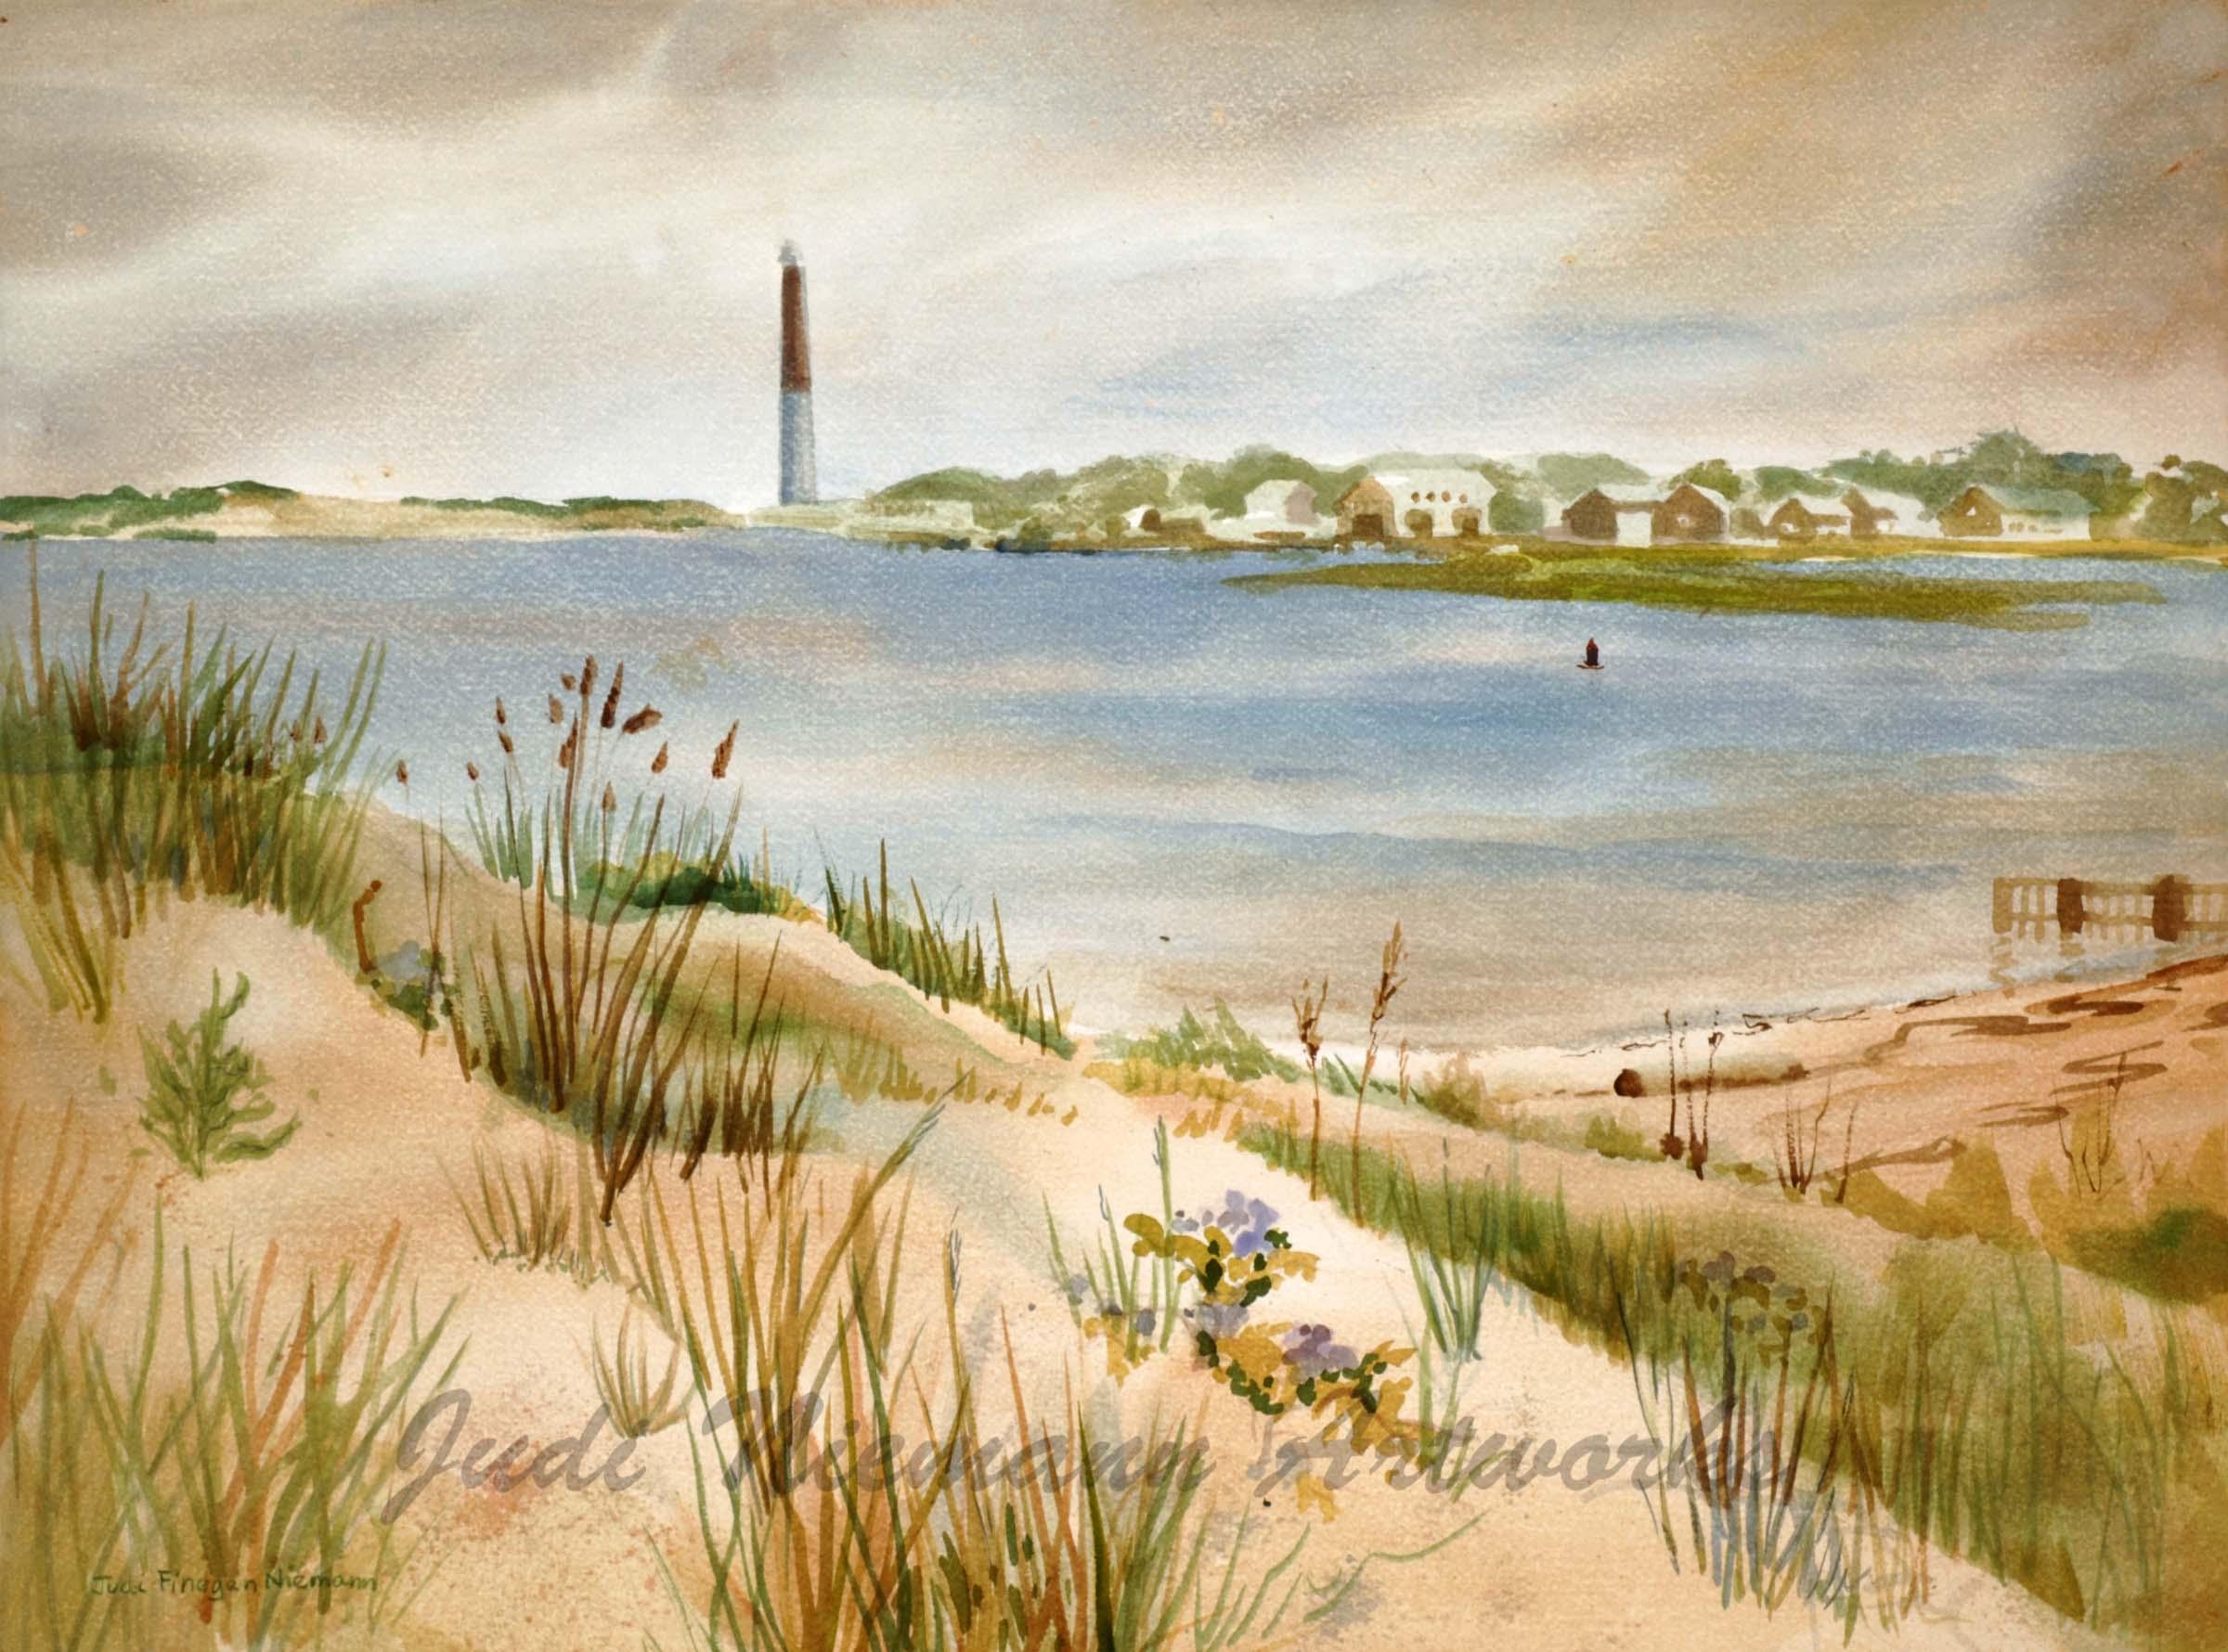 Barnegat Bay, New Jersey